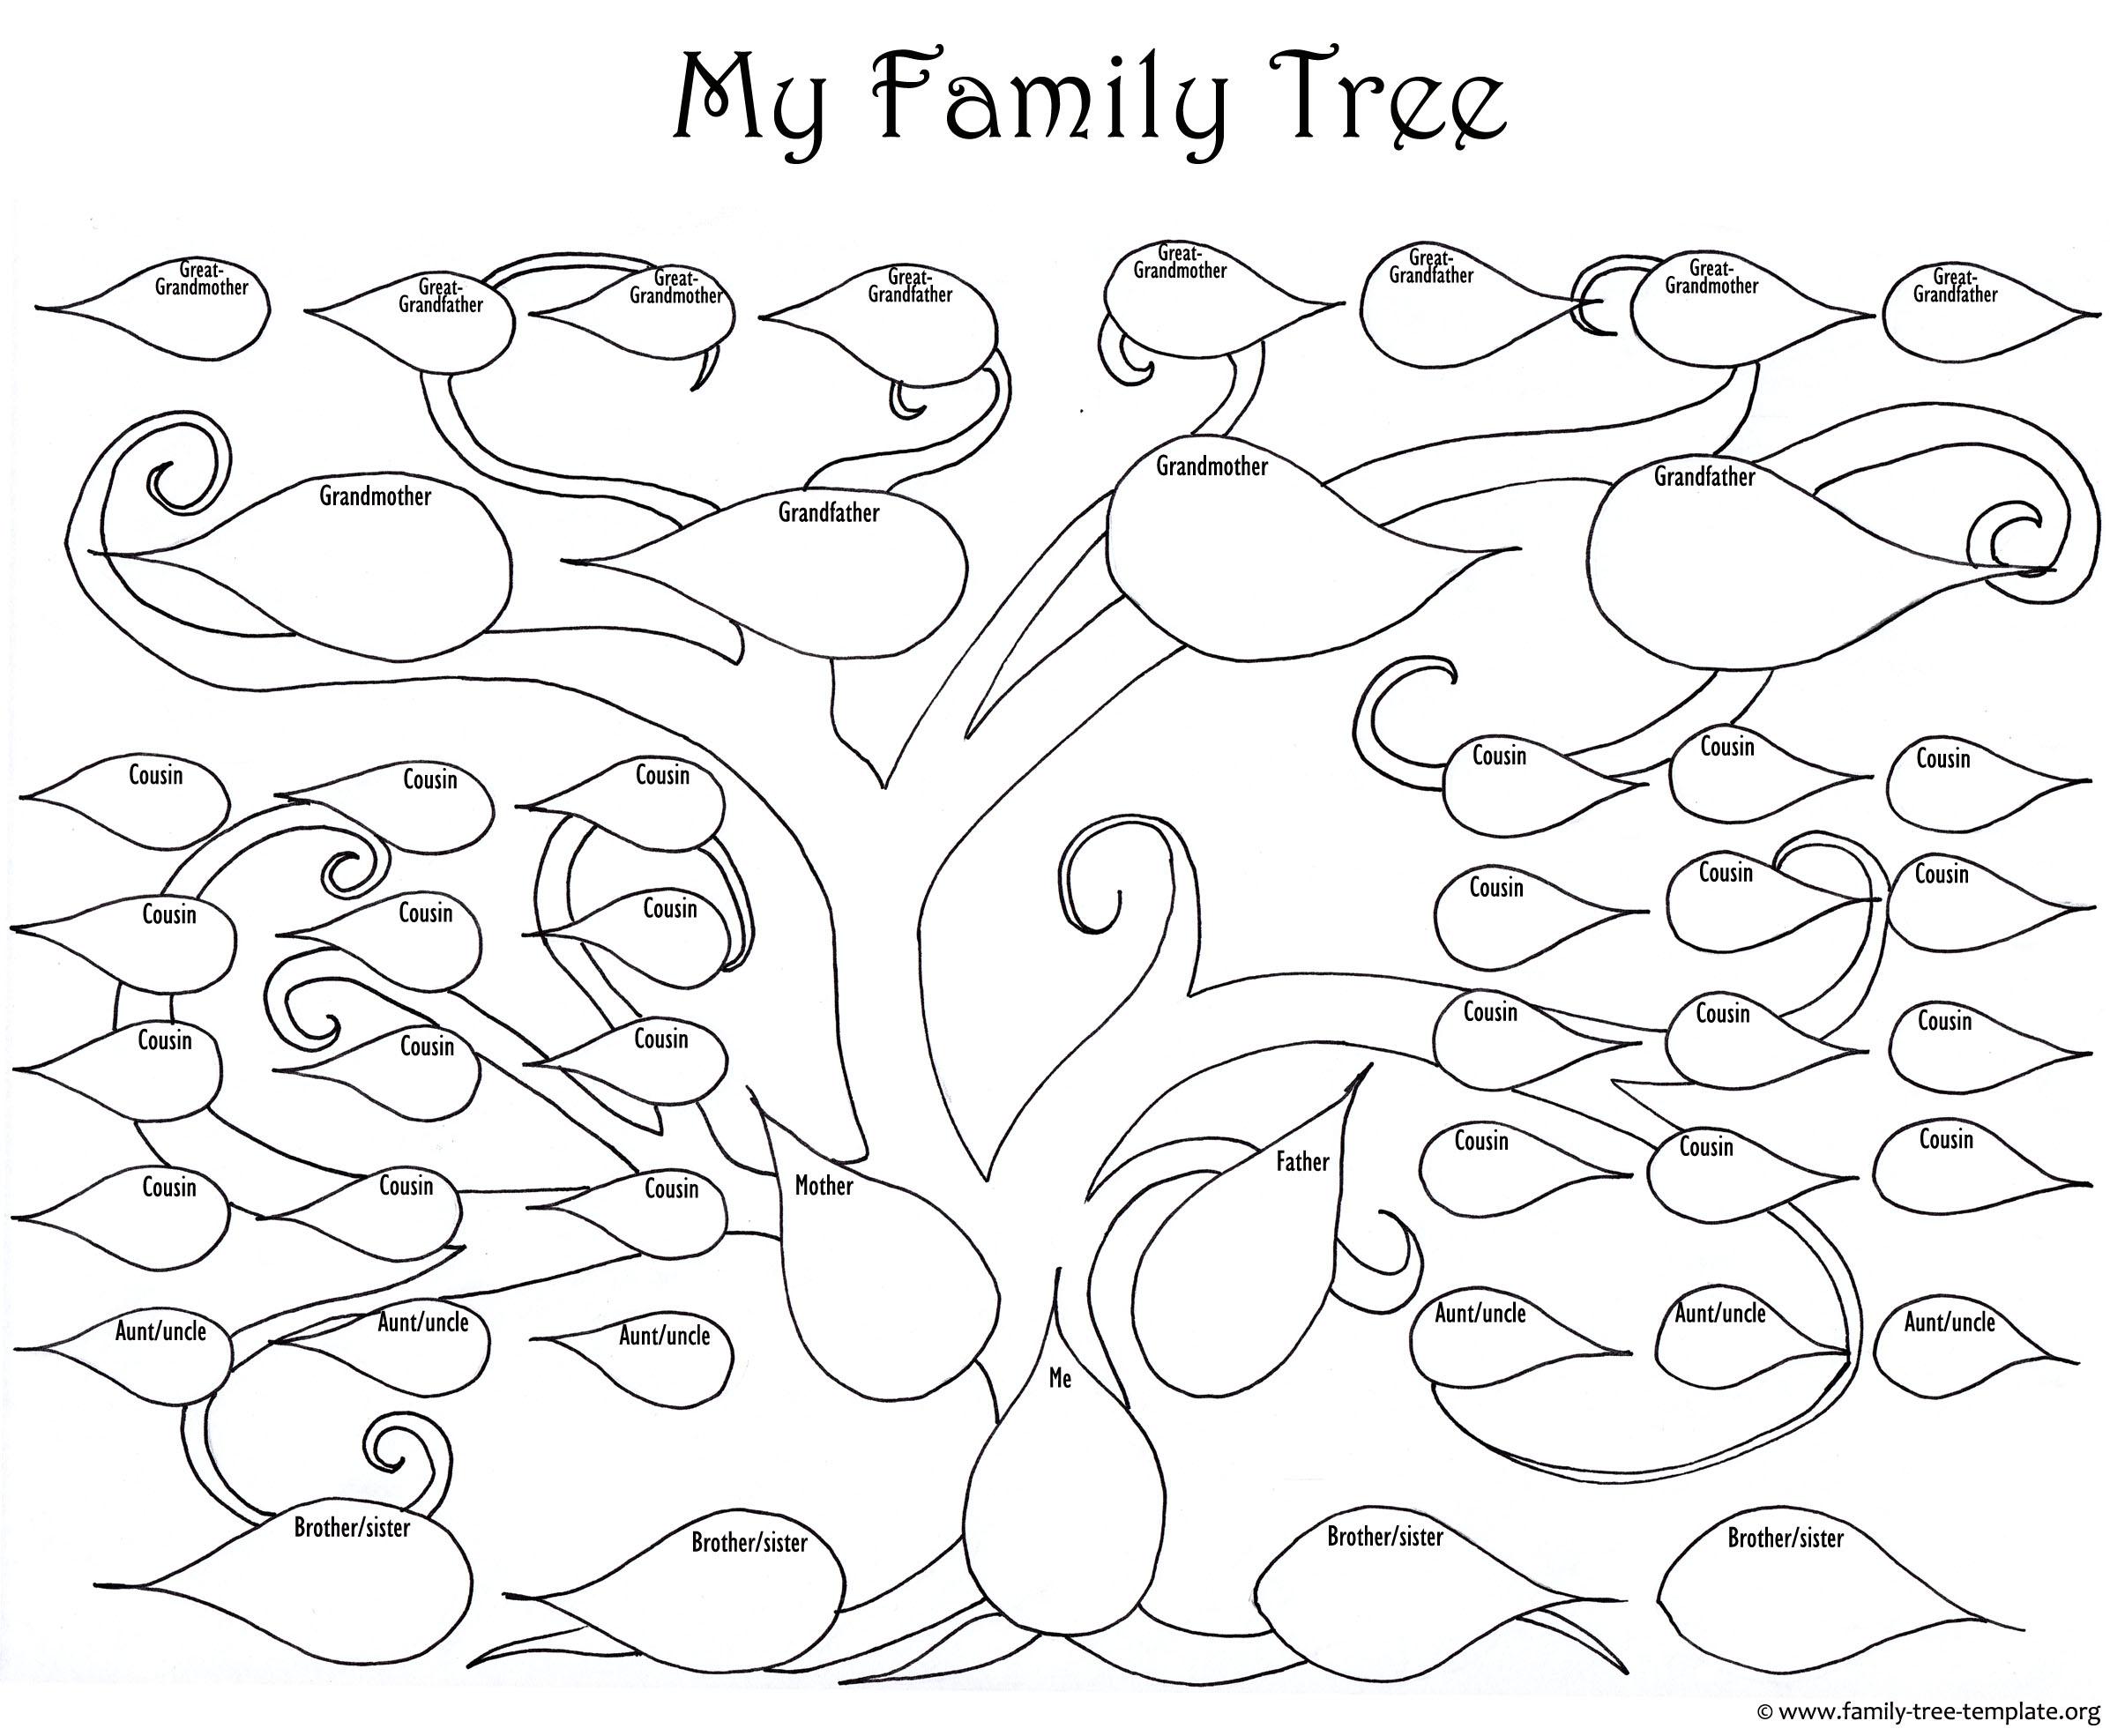 2393x1969 Simple Family Tree Drawing Family Tree Design Templates Free,tree